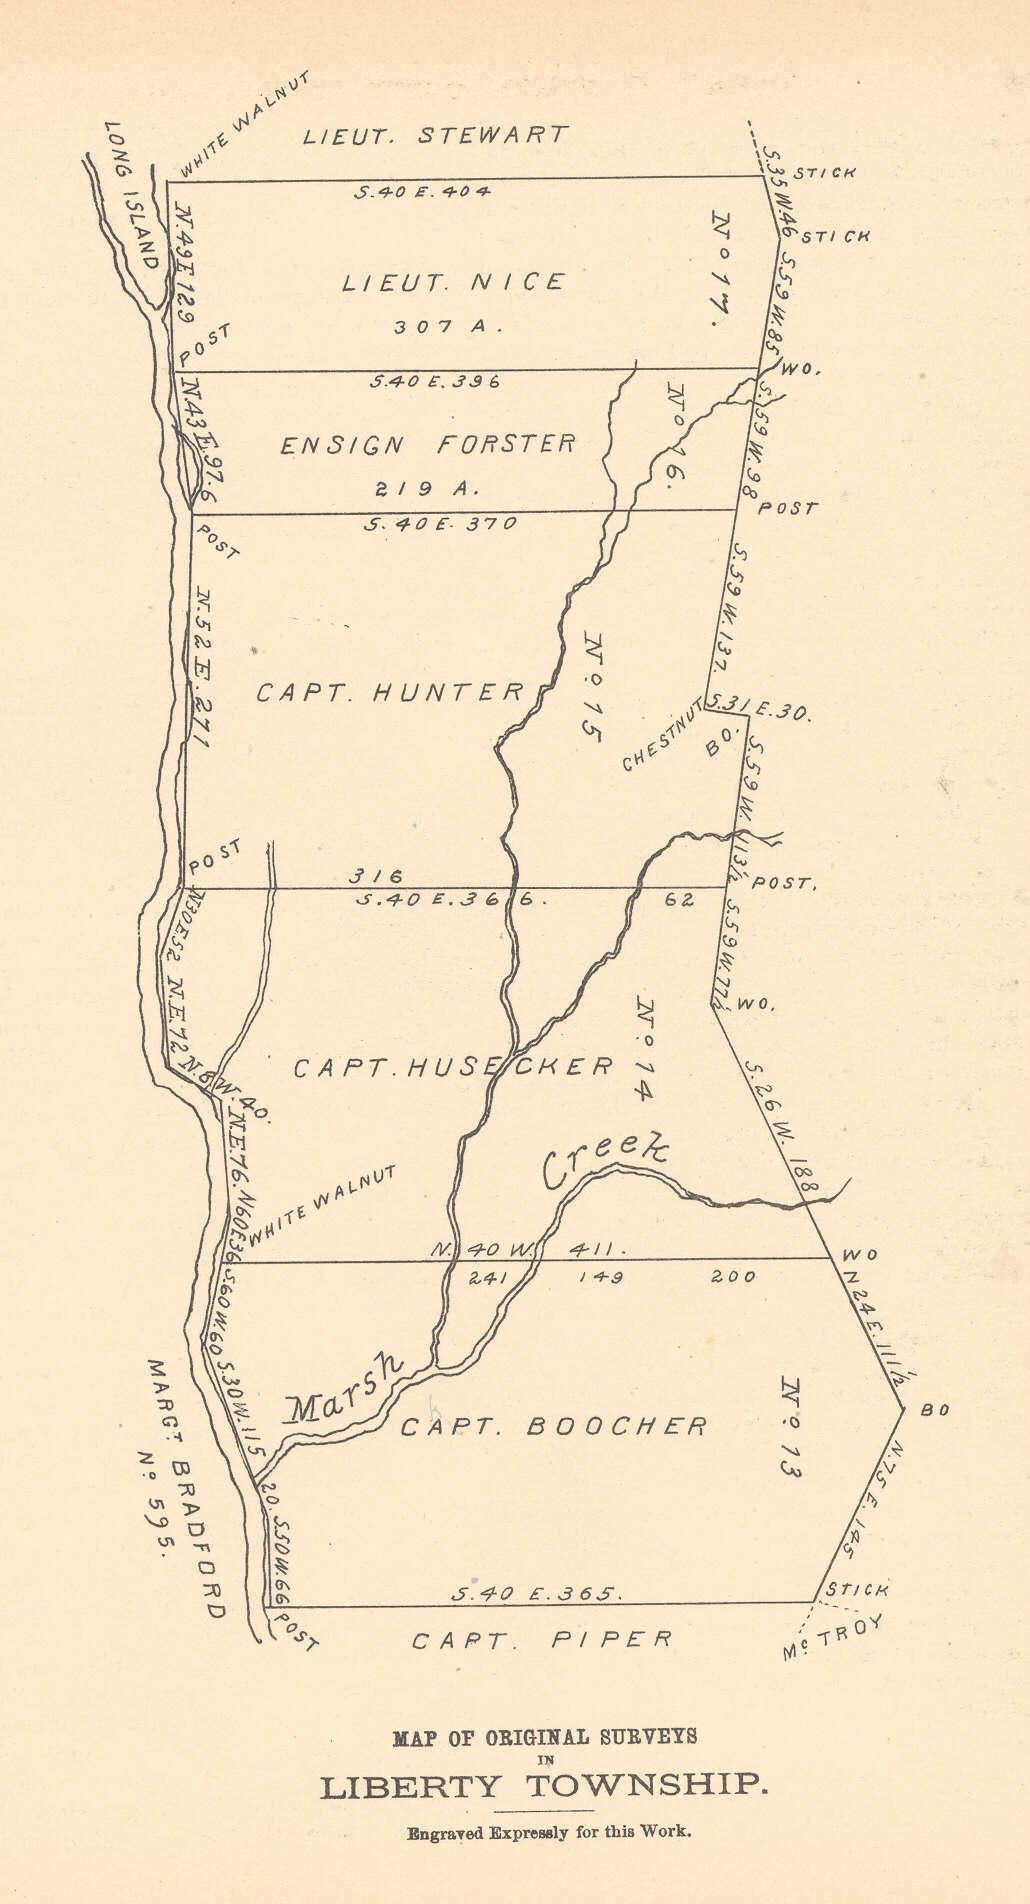 Lock Haven Original Surveys Sugar Valley Original Surveys 1814